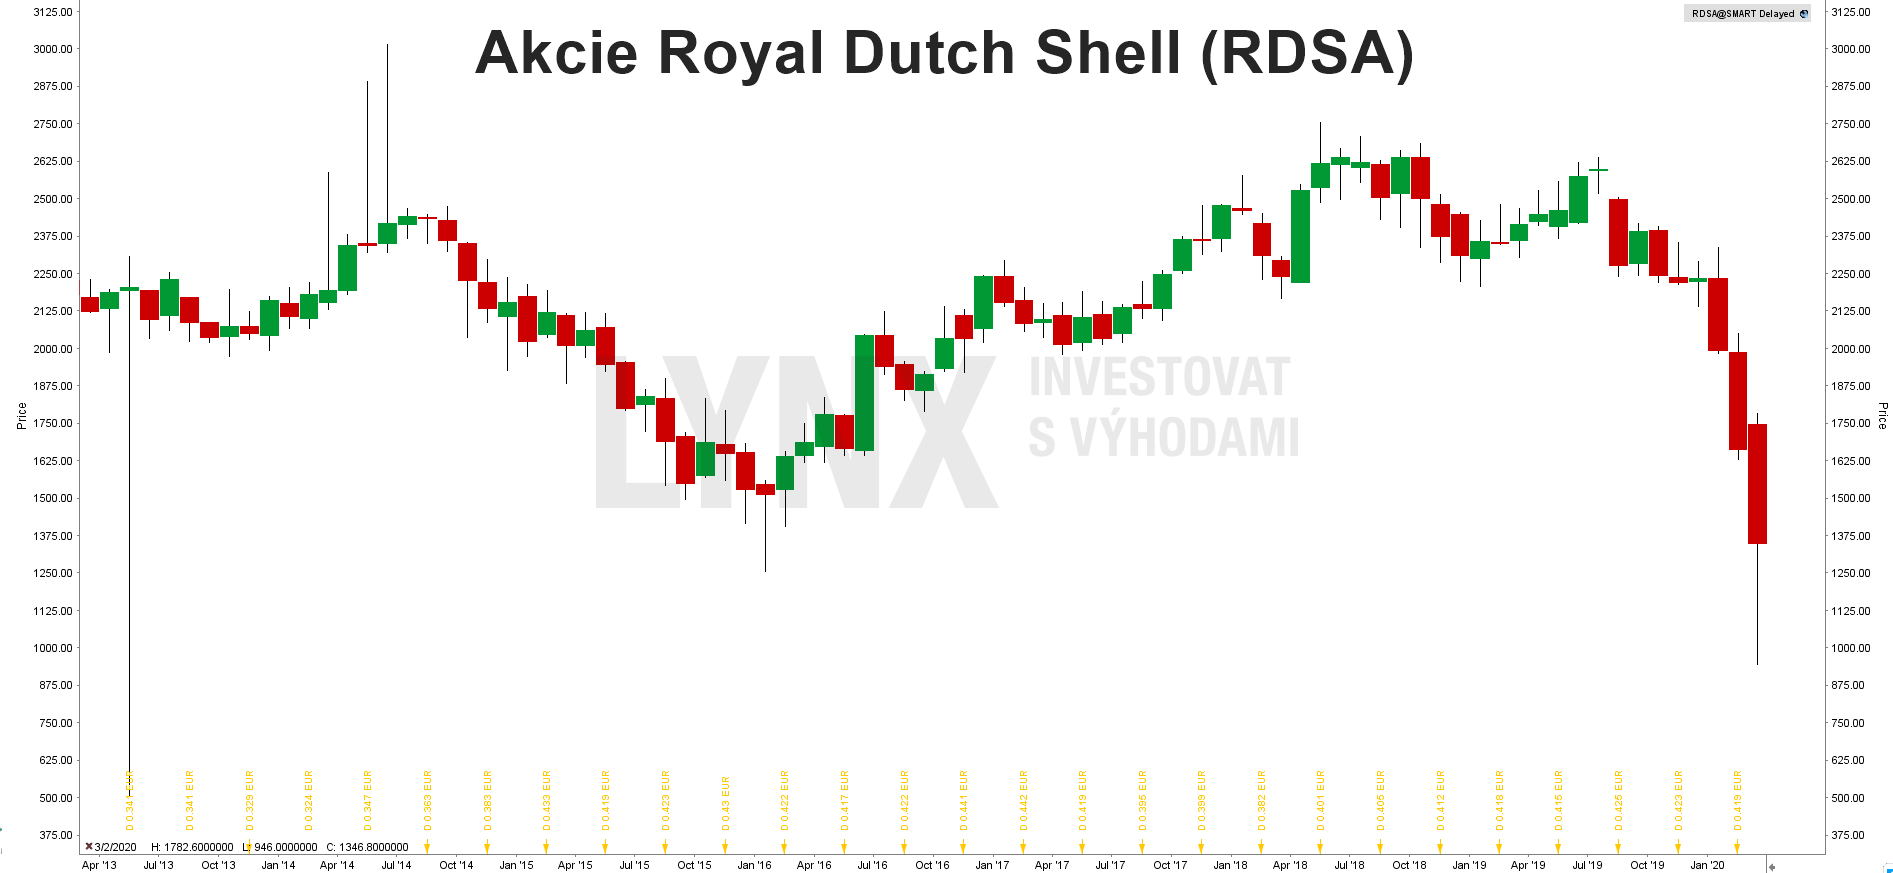 Akcie Royal Dutch Shell (RDSA)